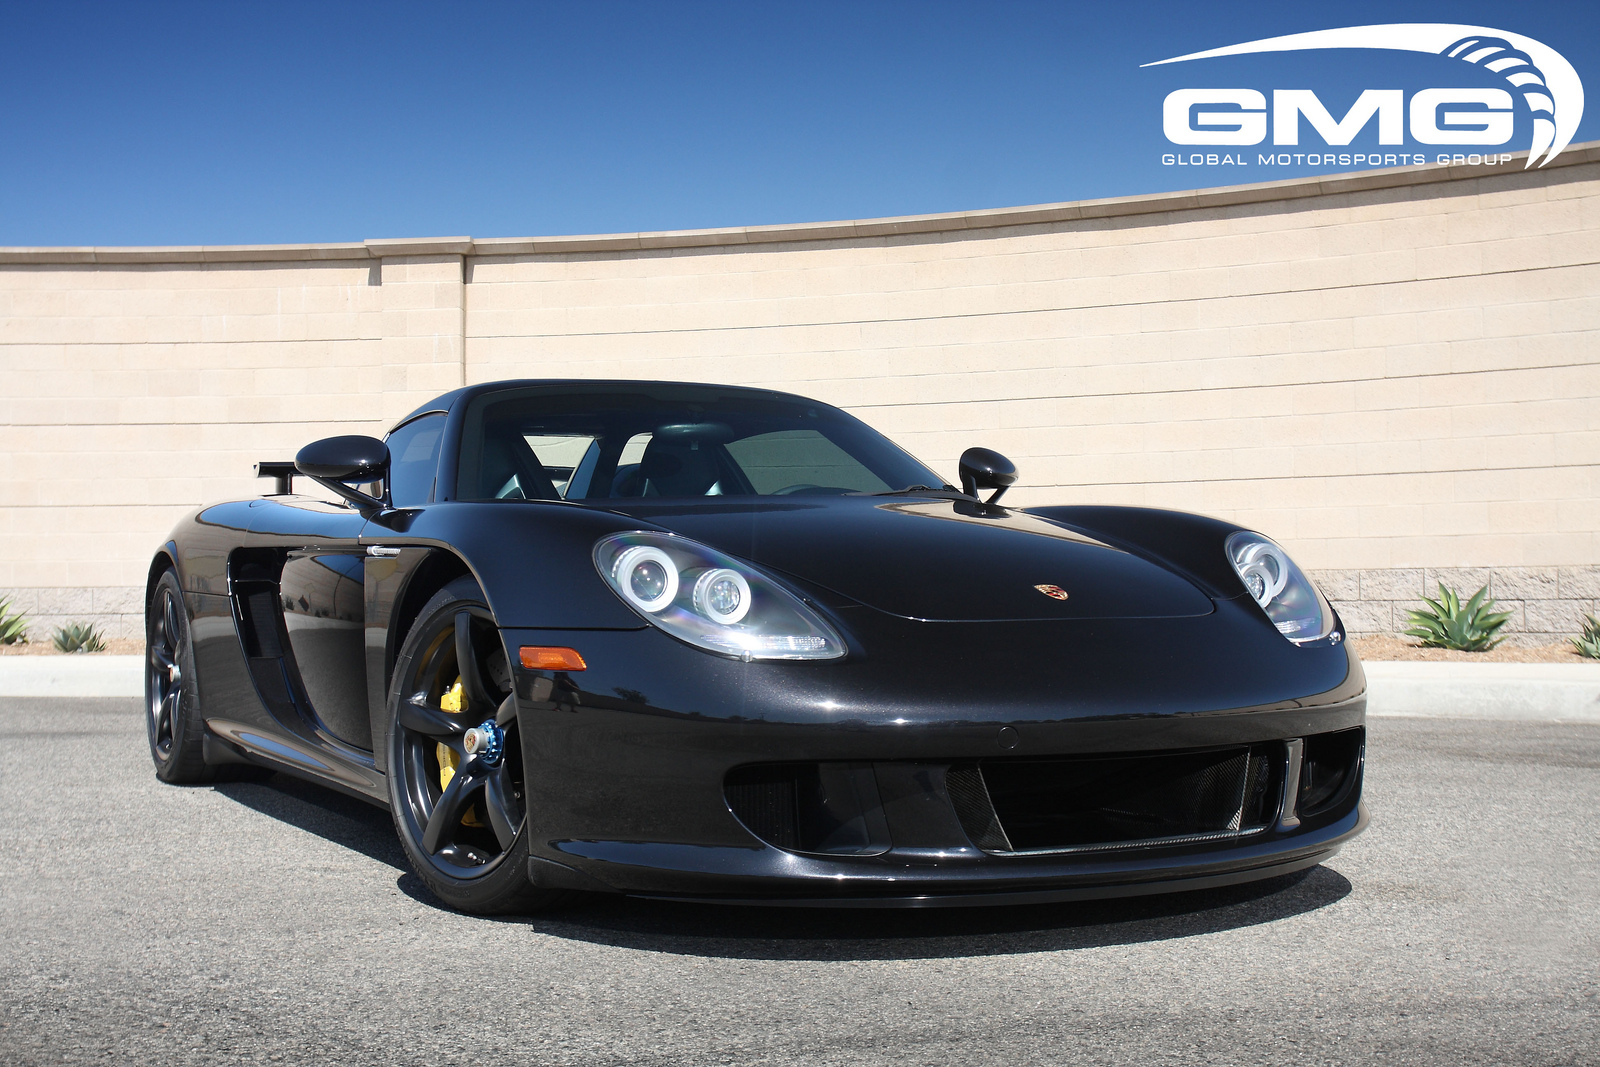 062e04a0ace6 Carrera GT Black - GMG Racing